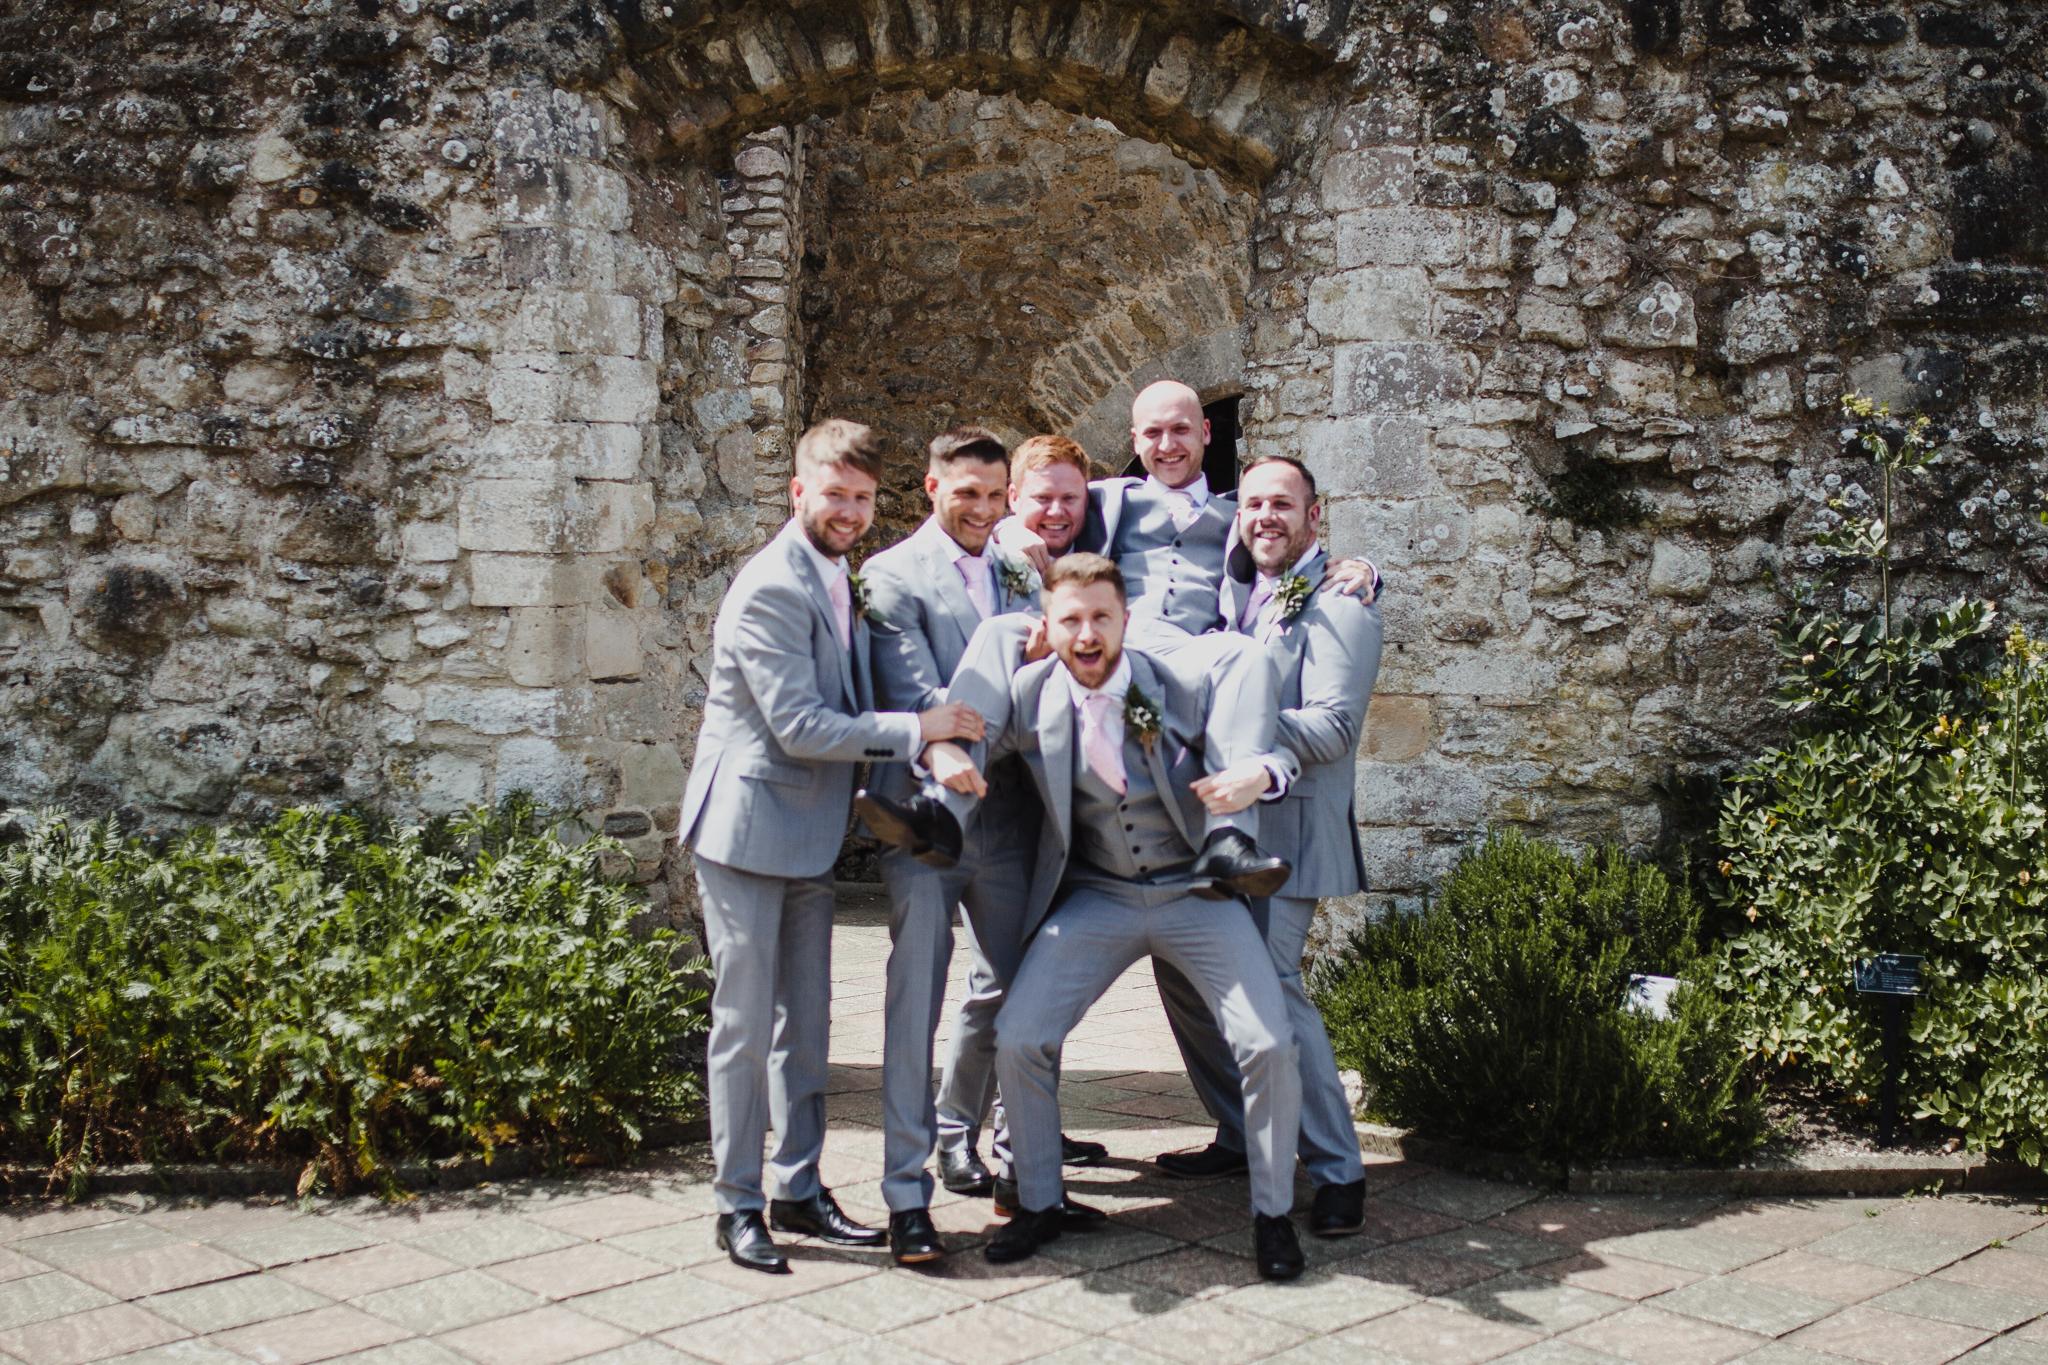 Groomsmen lifting up groom and celebrating